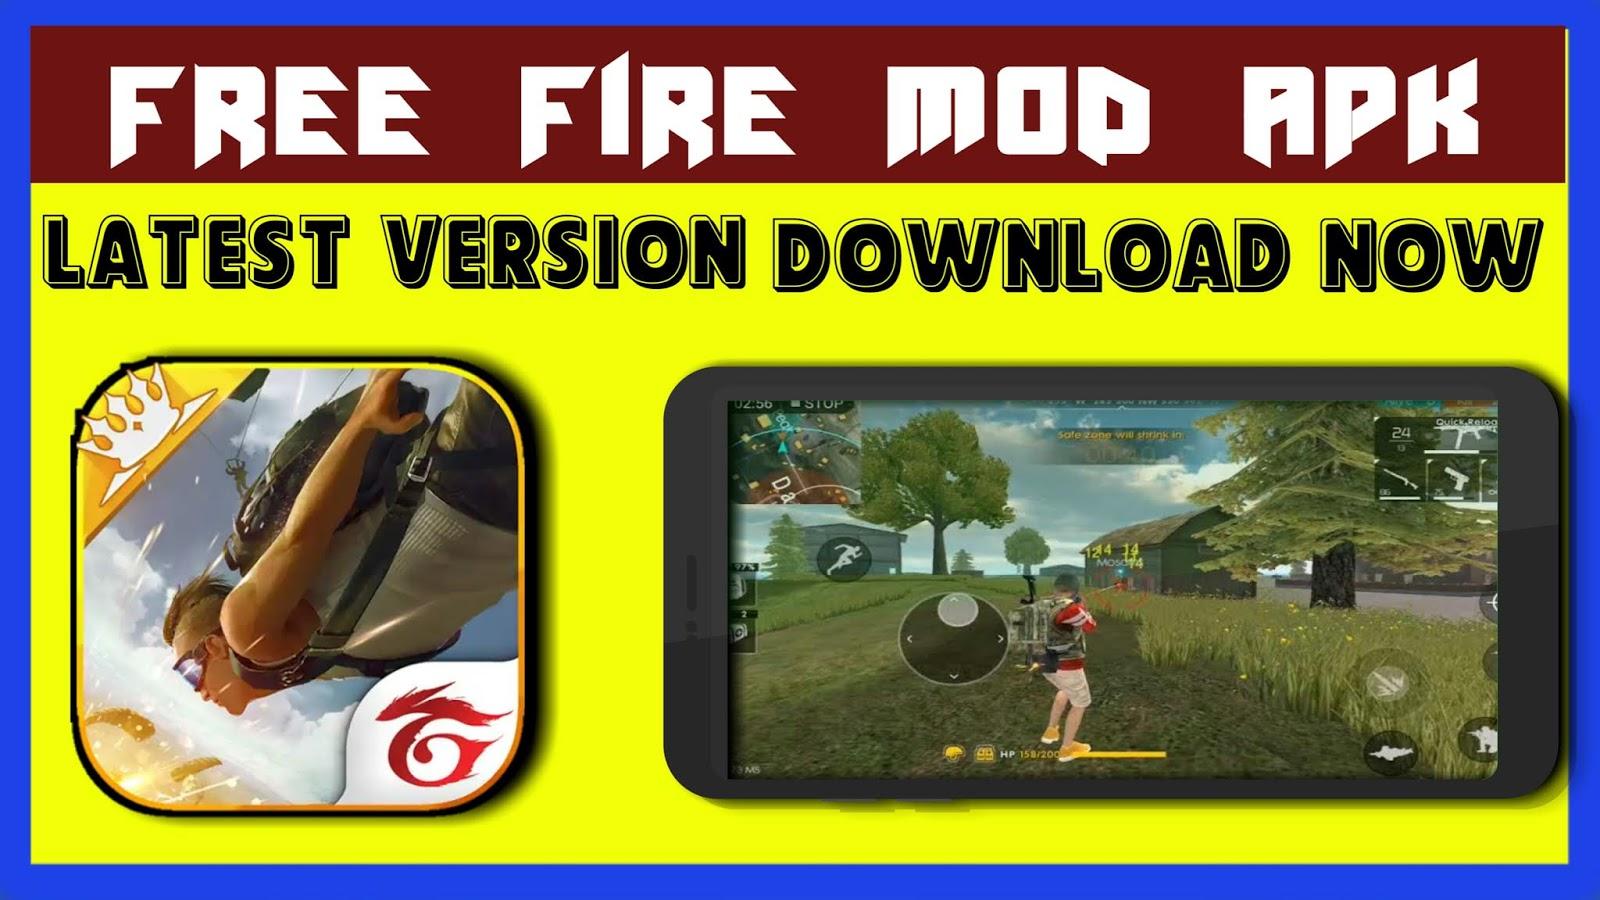 Download latest garena free fire mod apk 2019 - MLC GYANS